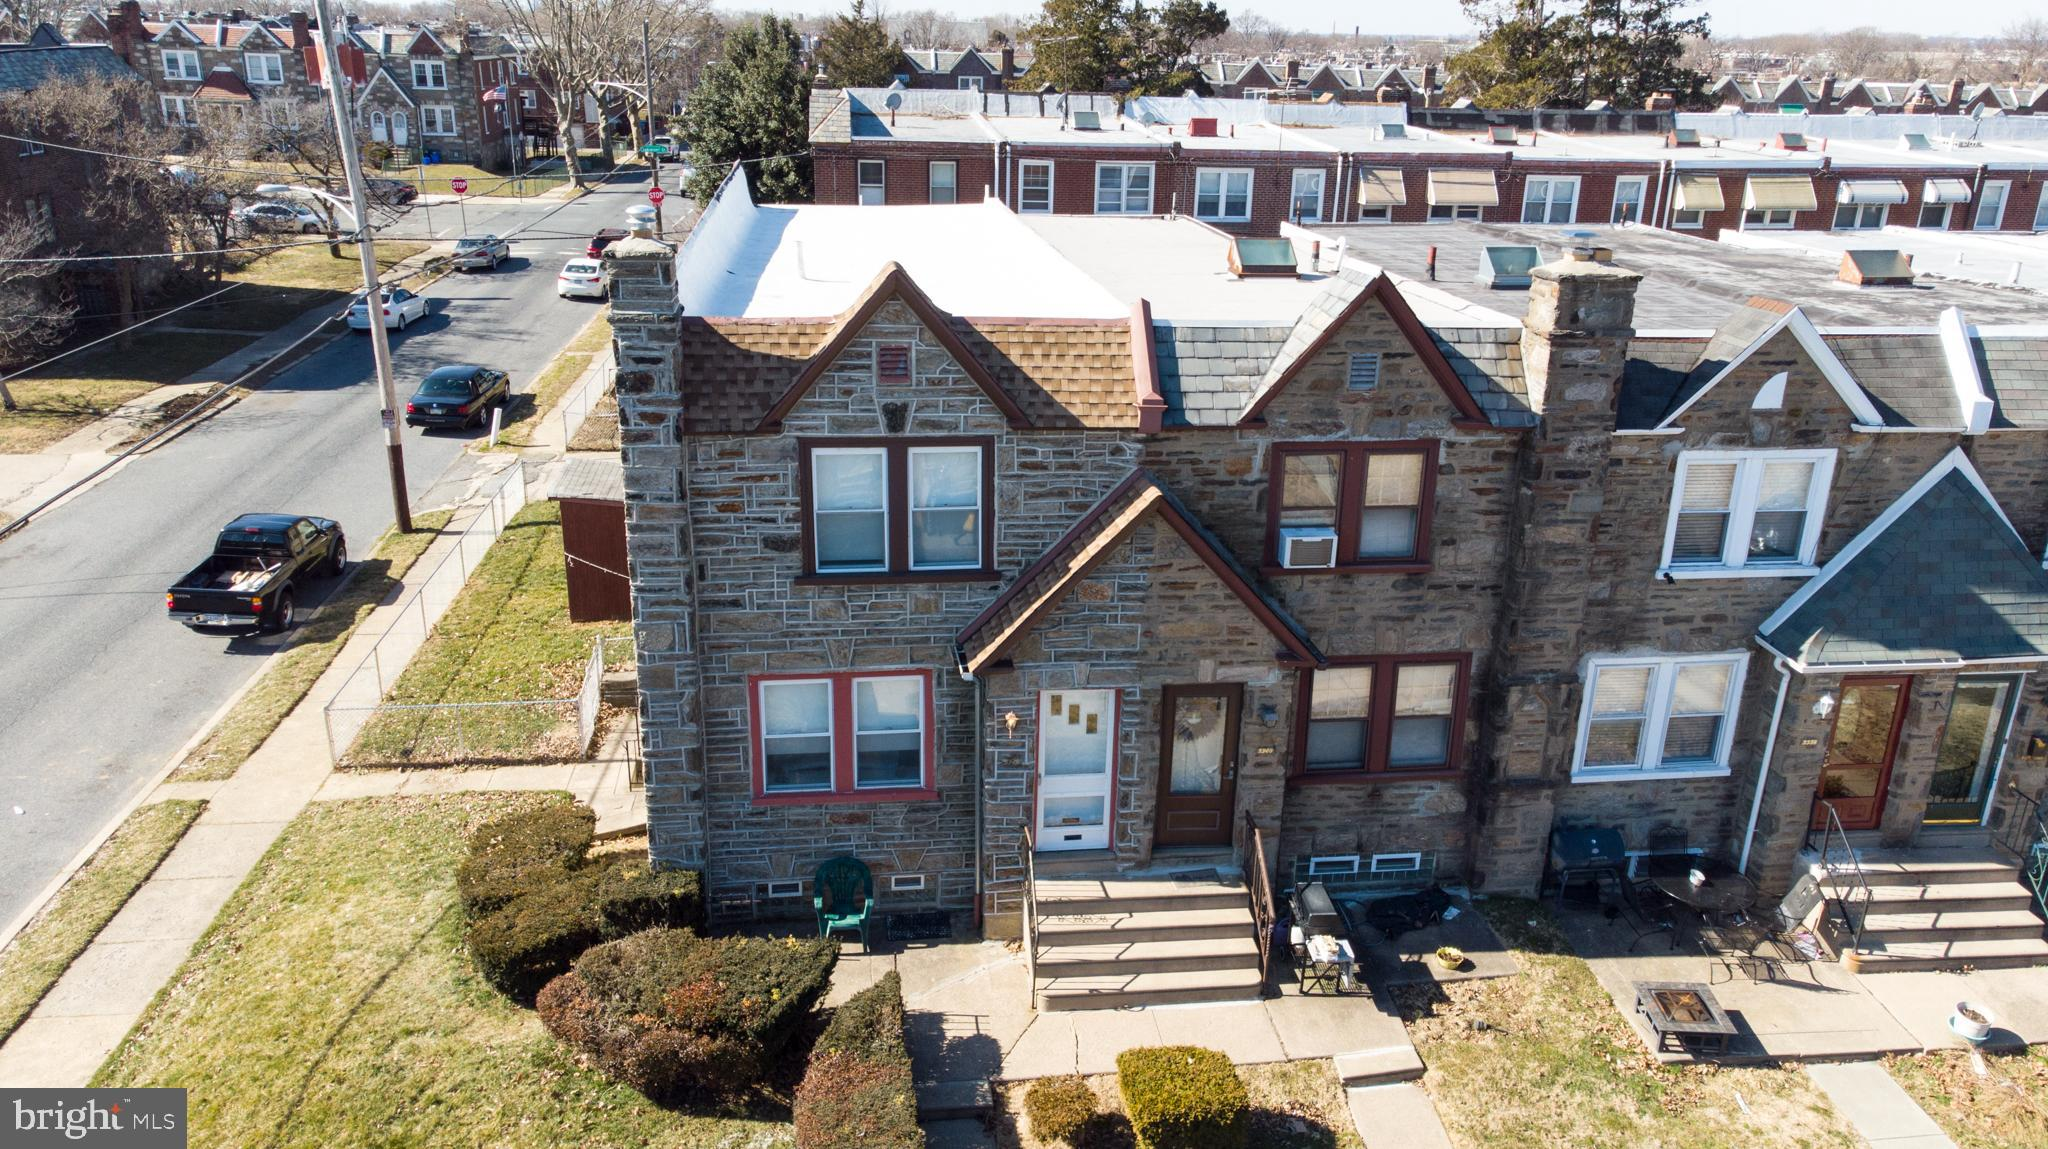 3342 CHIPPENDALE STREET, PHILADELPHIA, PA 19136